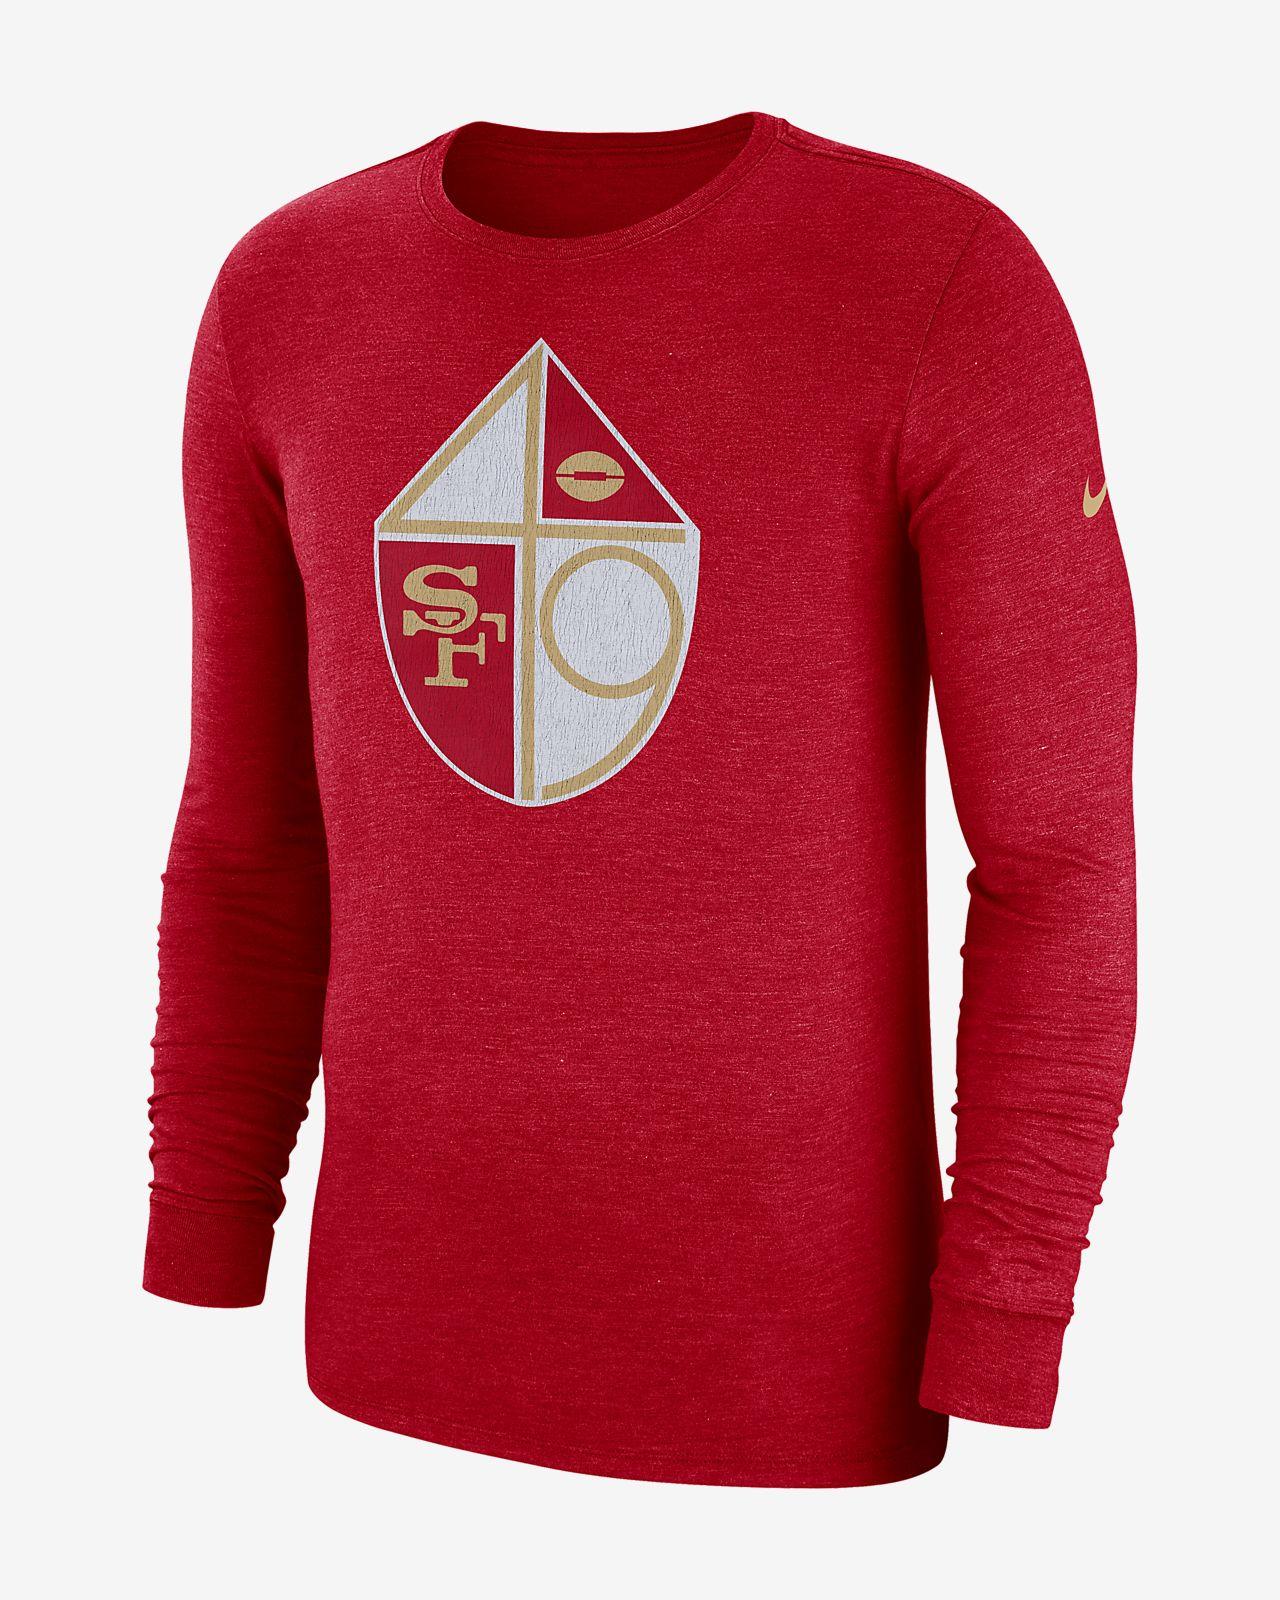 Nike (NFL 49ers) Men's Tri-Blend Long-Sleeve T-Shirt